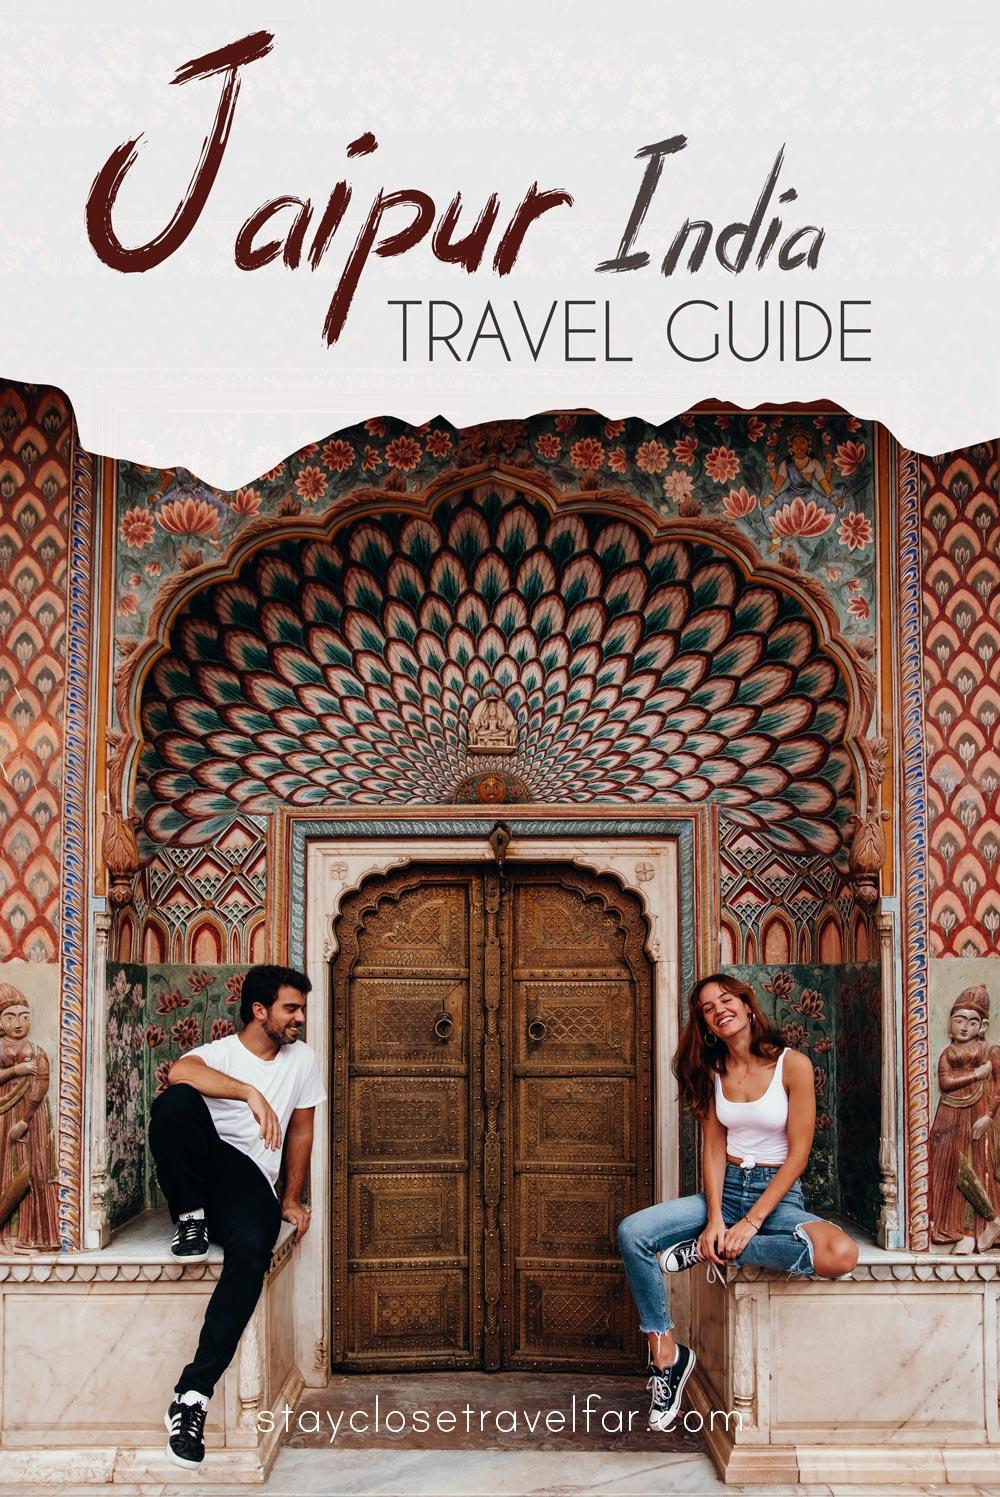 jaipur-india-travel-guide